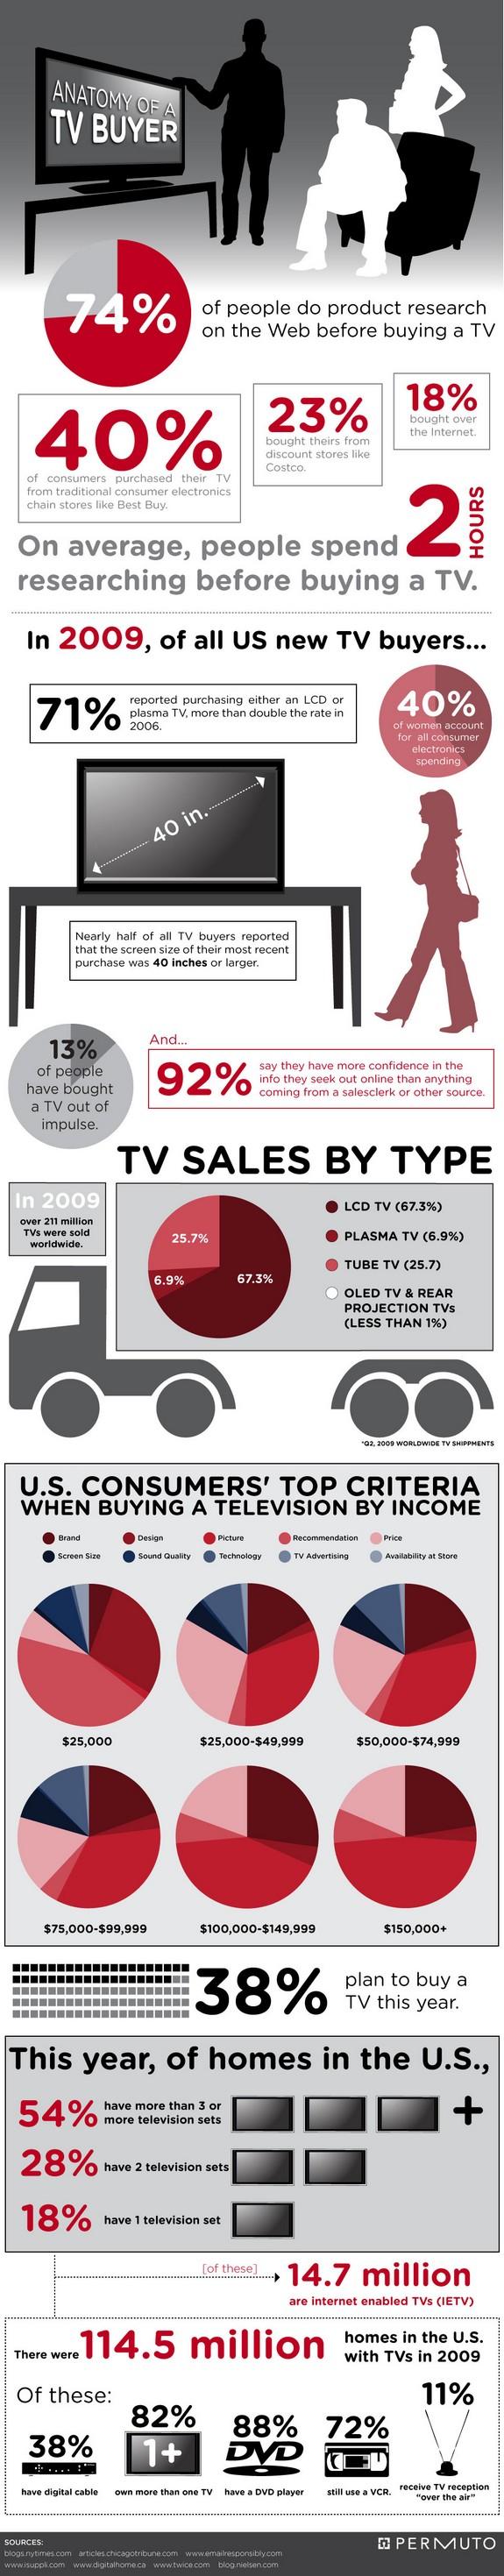 Anatomy-of-a-tv-buyer